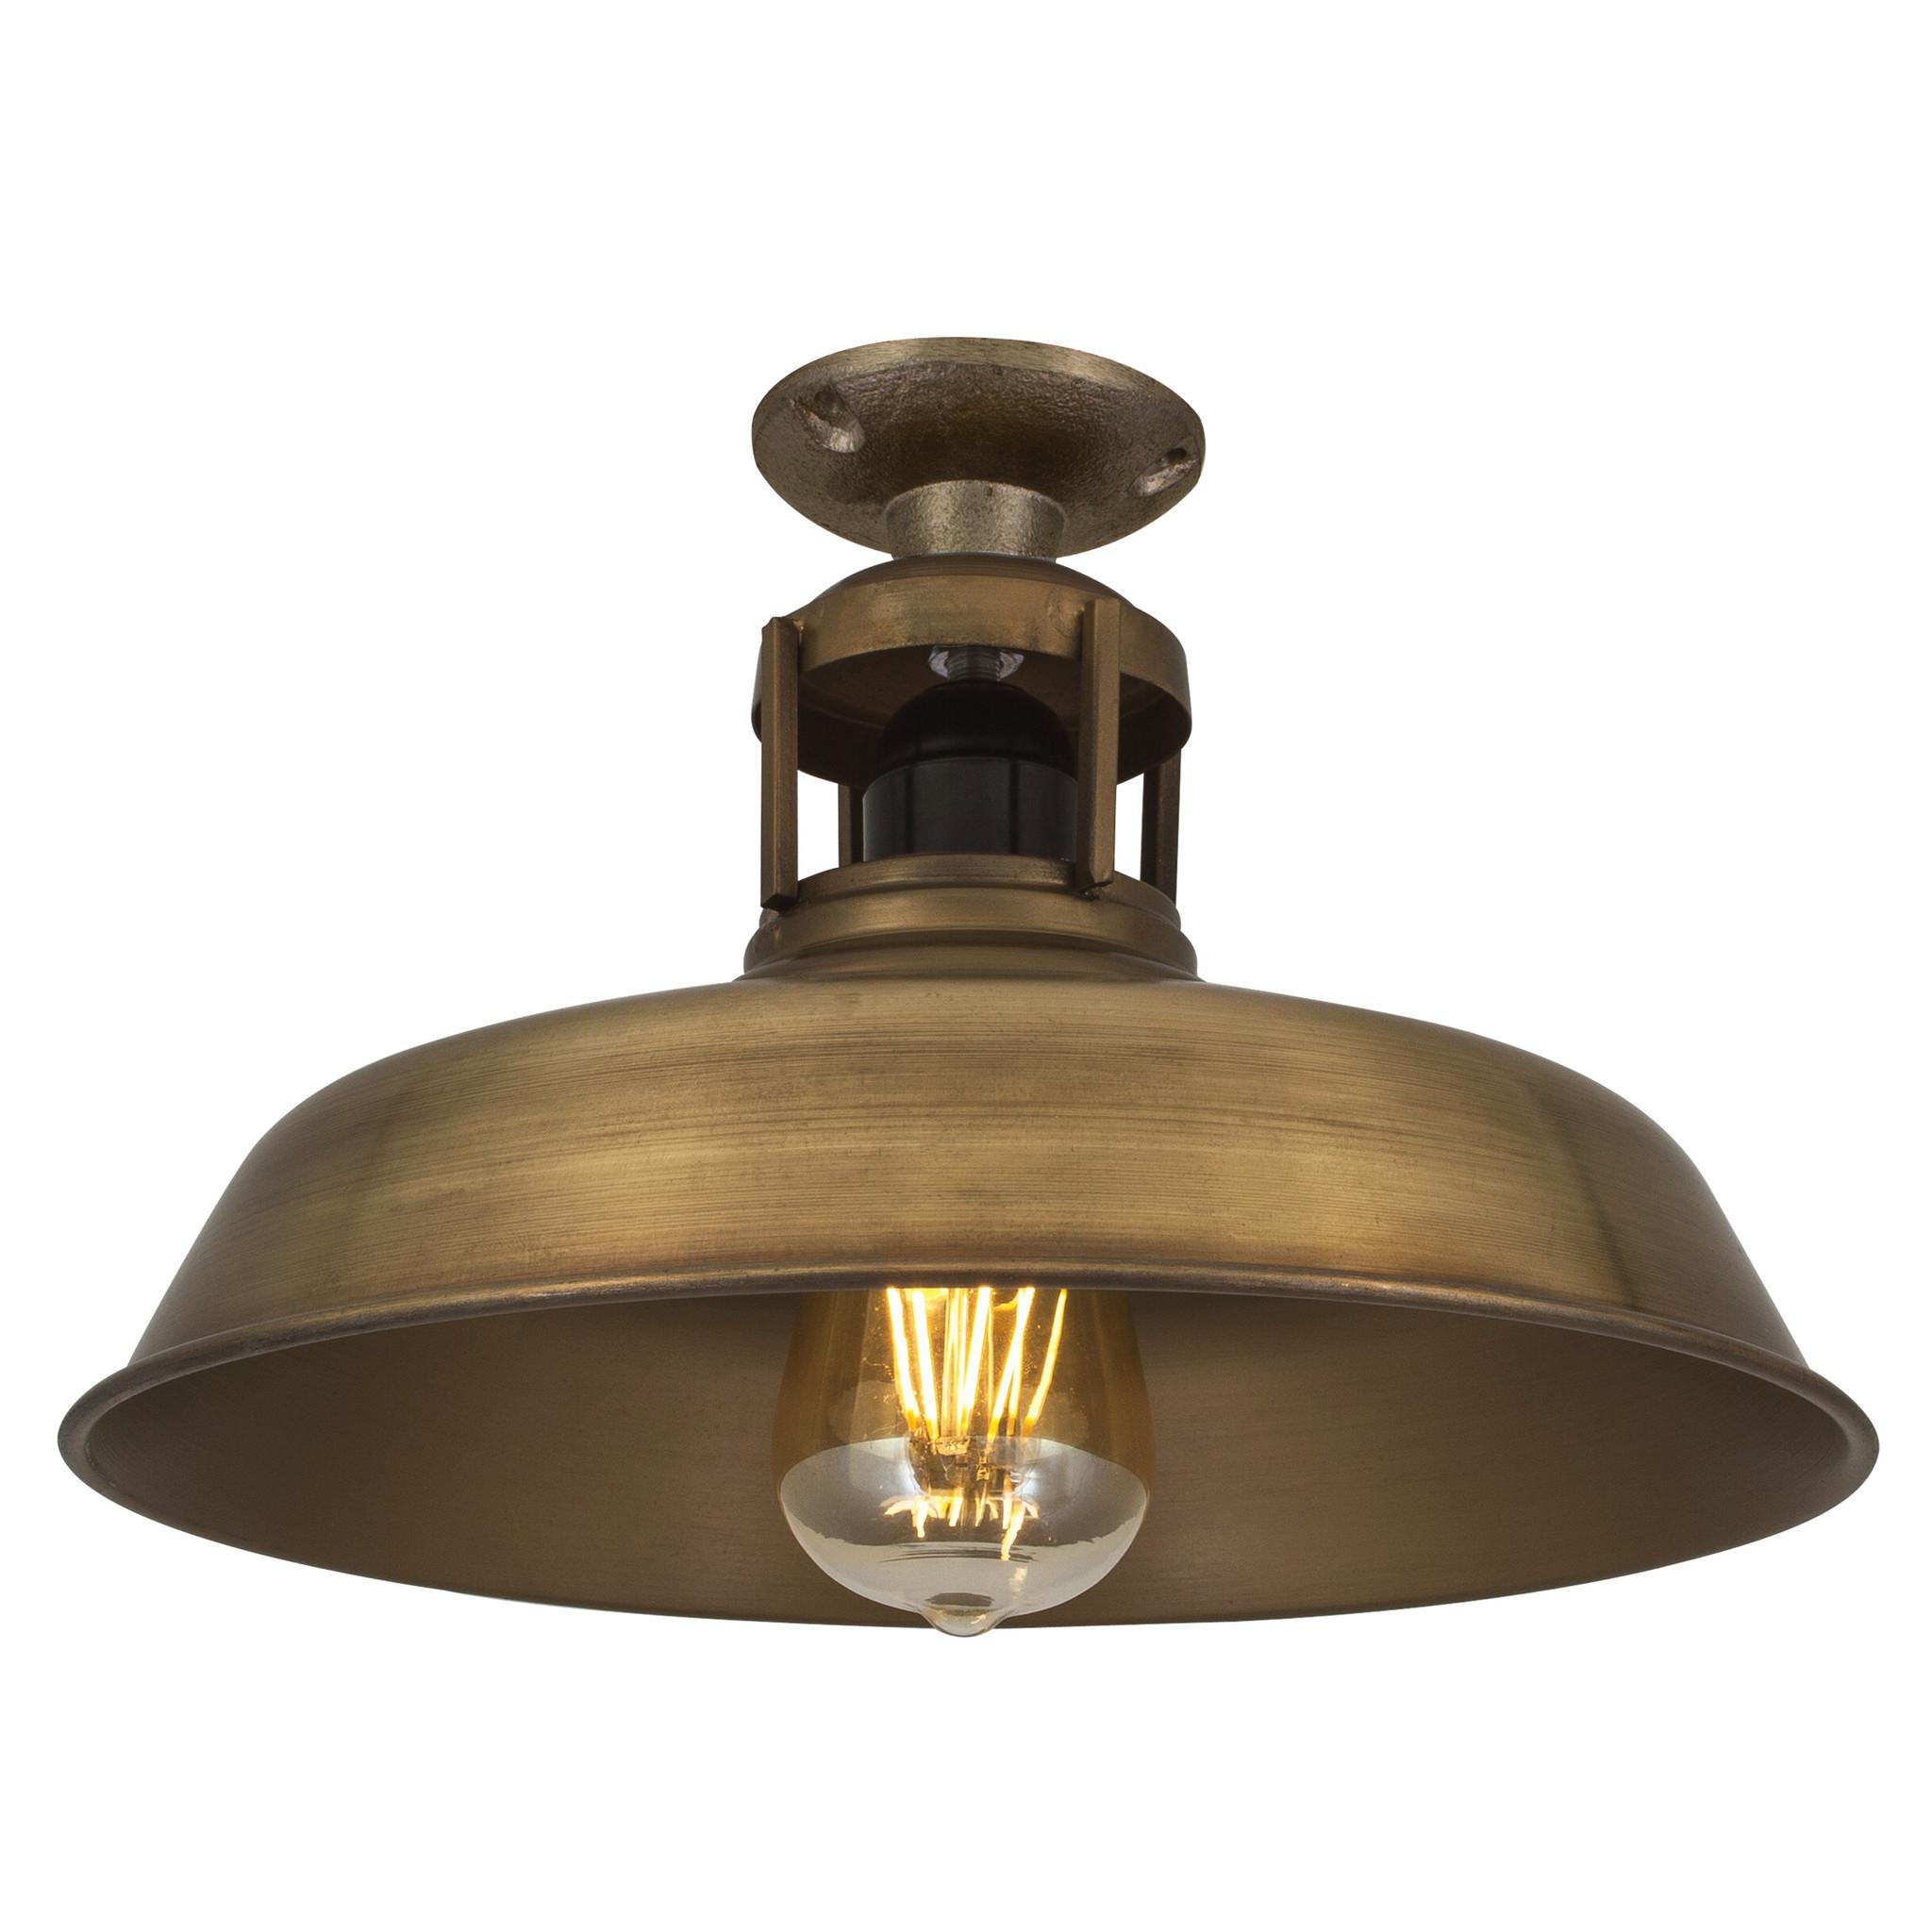 10 benefits of Brass ceiling lights